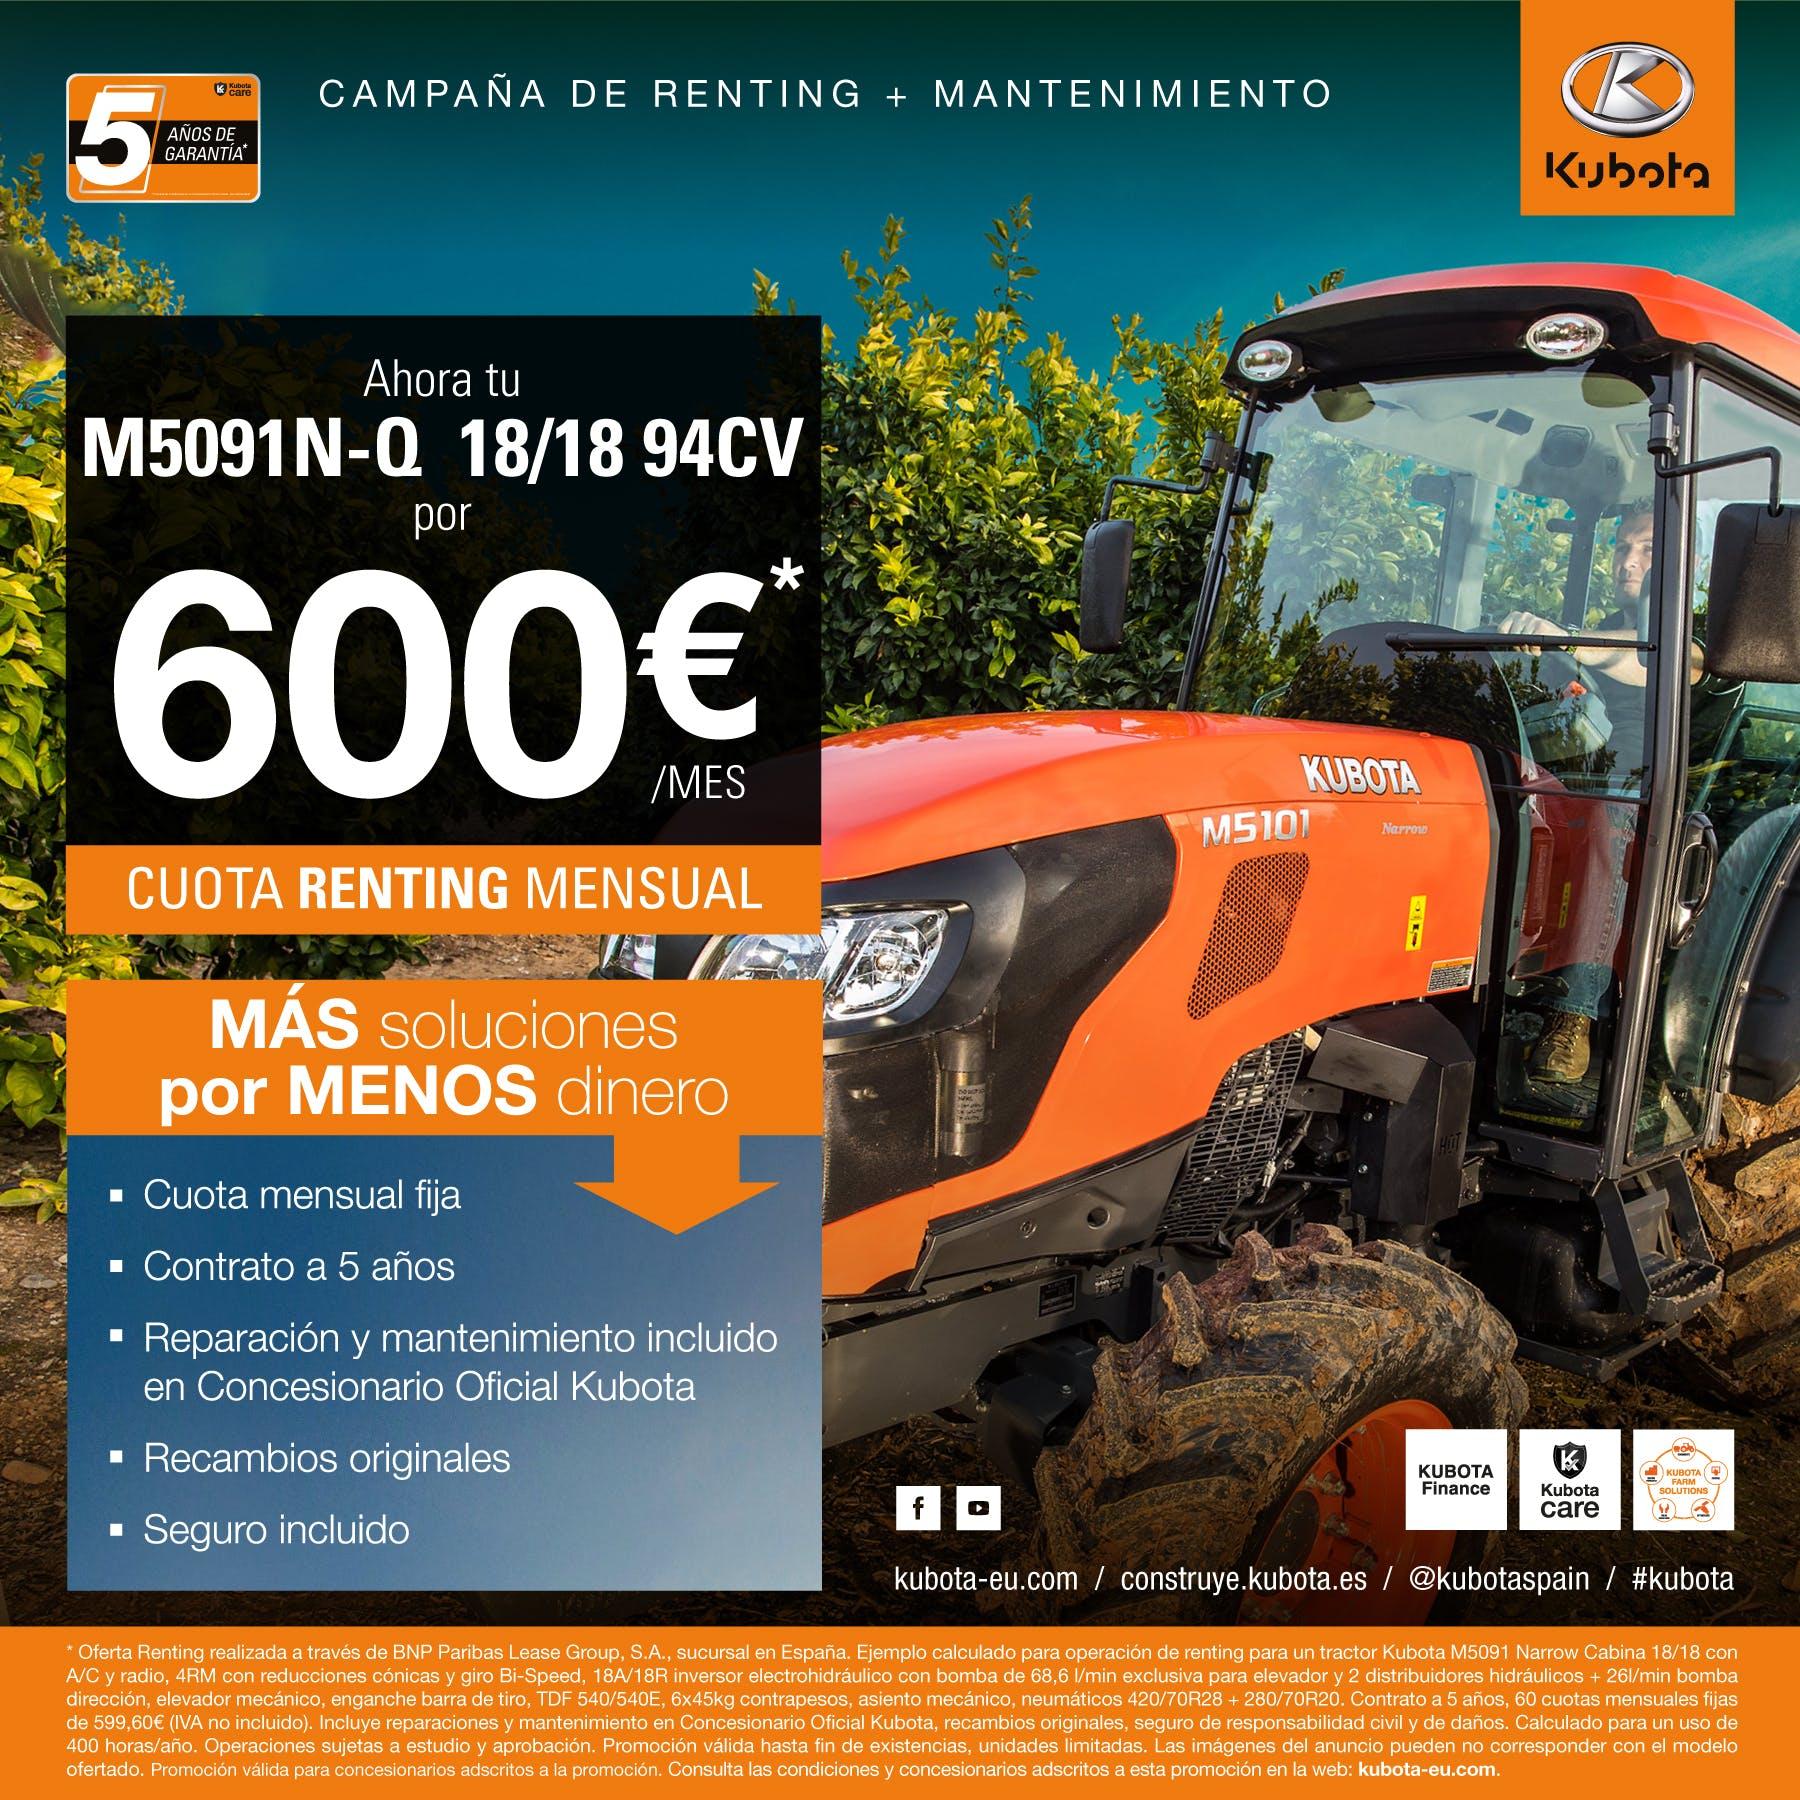 Oferta Renting tractor M5091N-Q 18/18 (94CV)